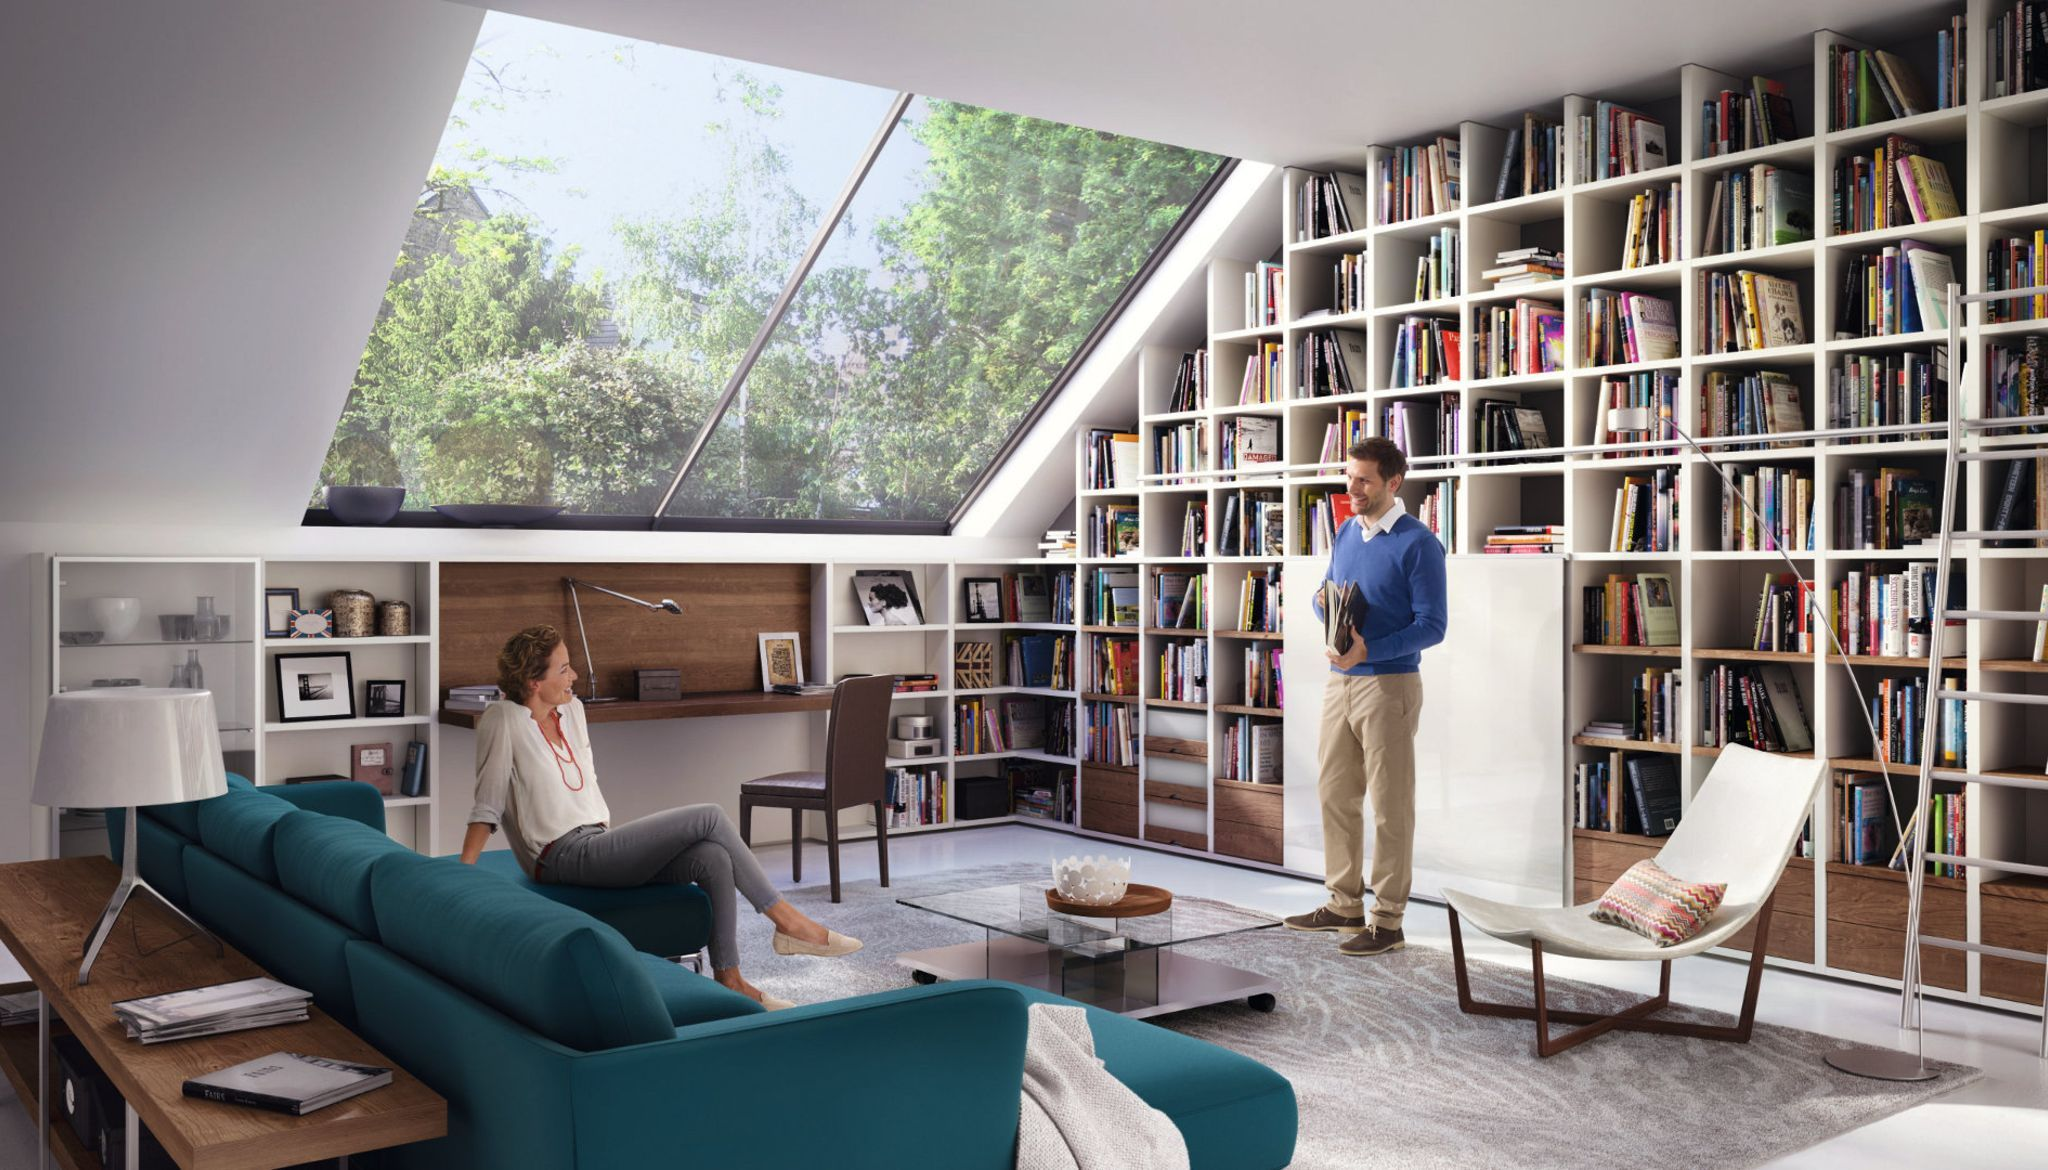 Möbel Marke living hülsta die möbelmarke 现代风格客厅modern livingroom